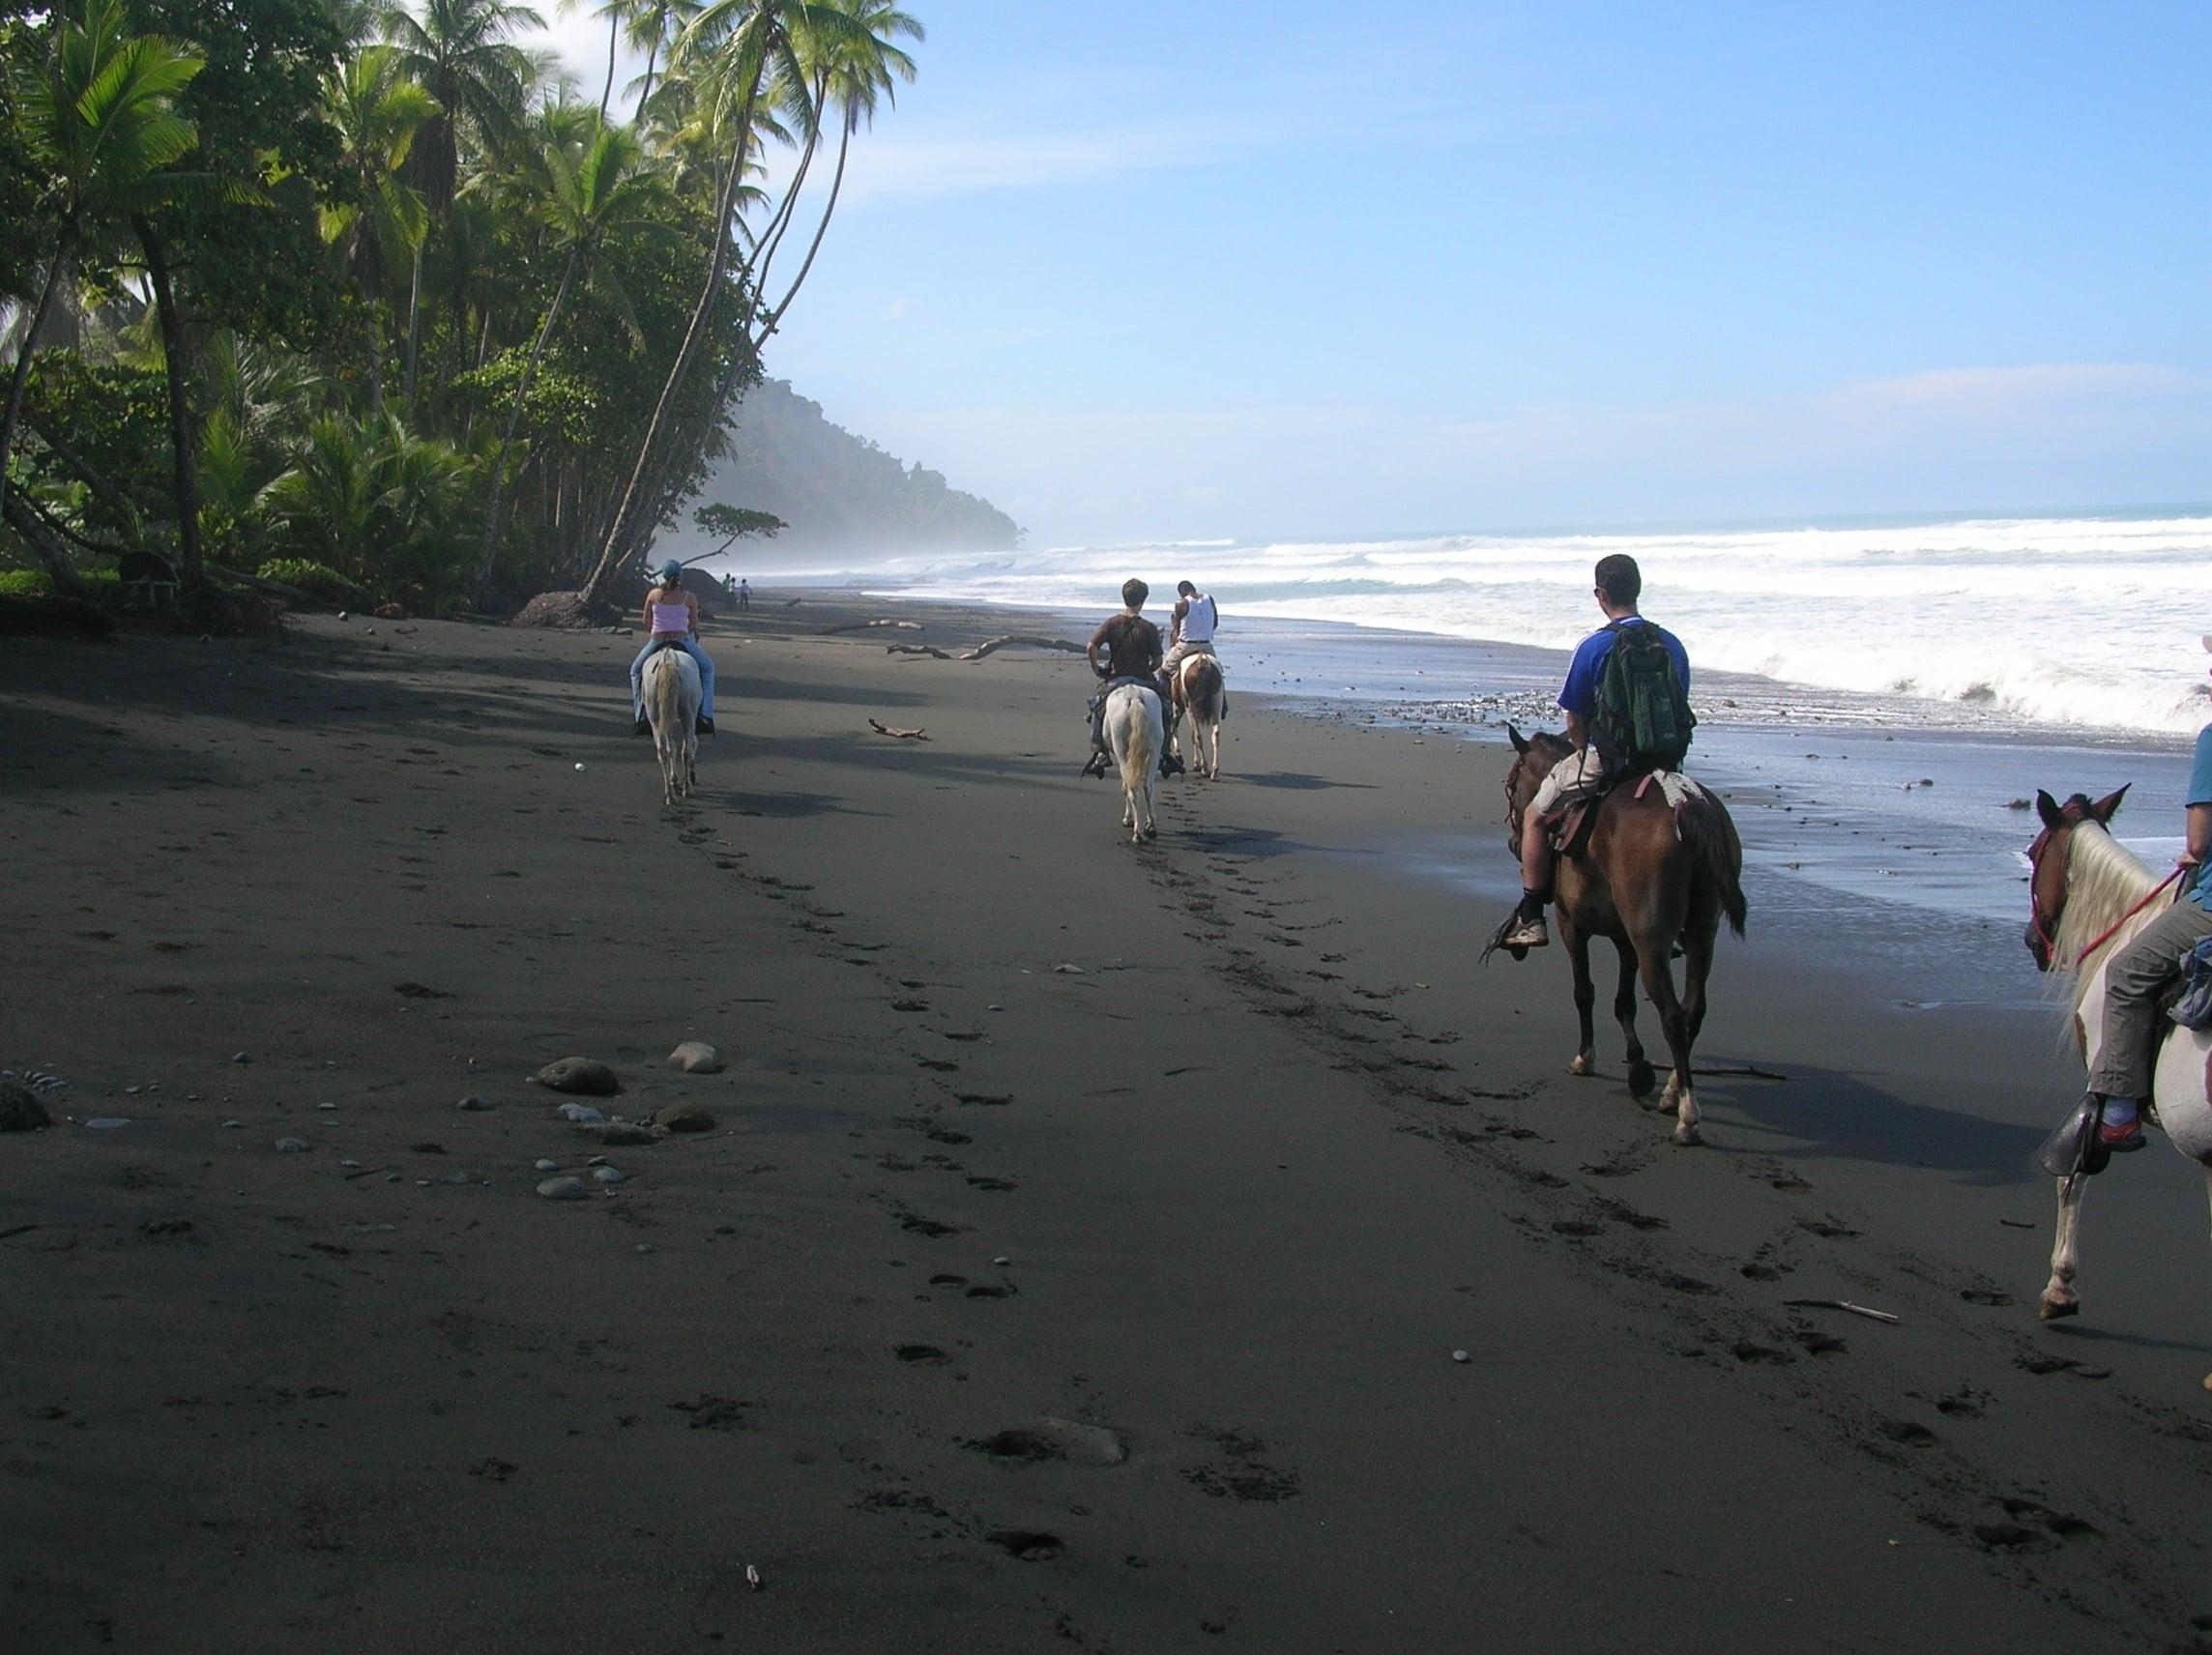 group riding horses on the beach